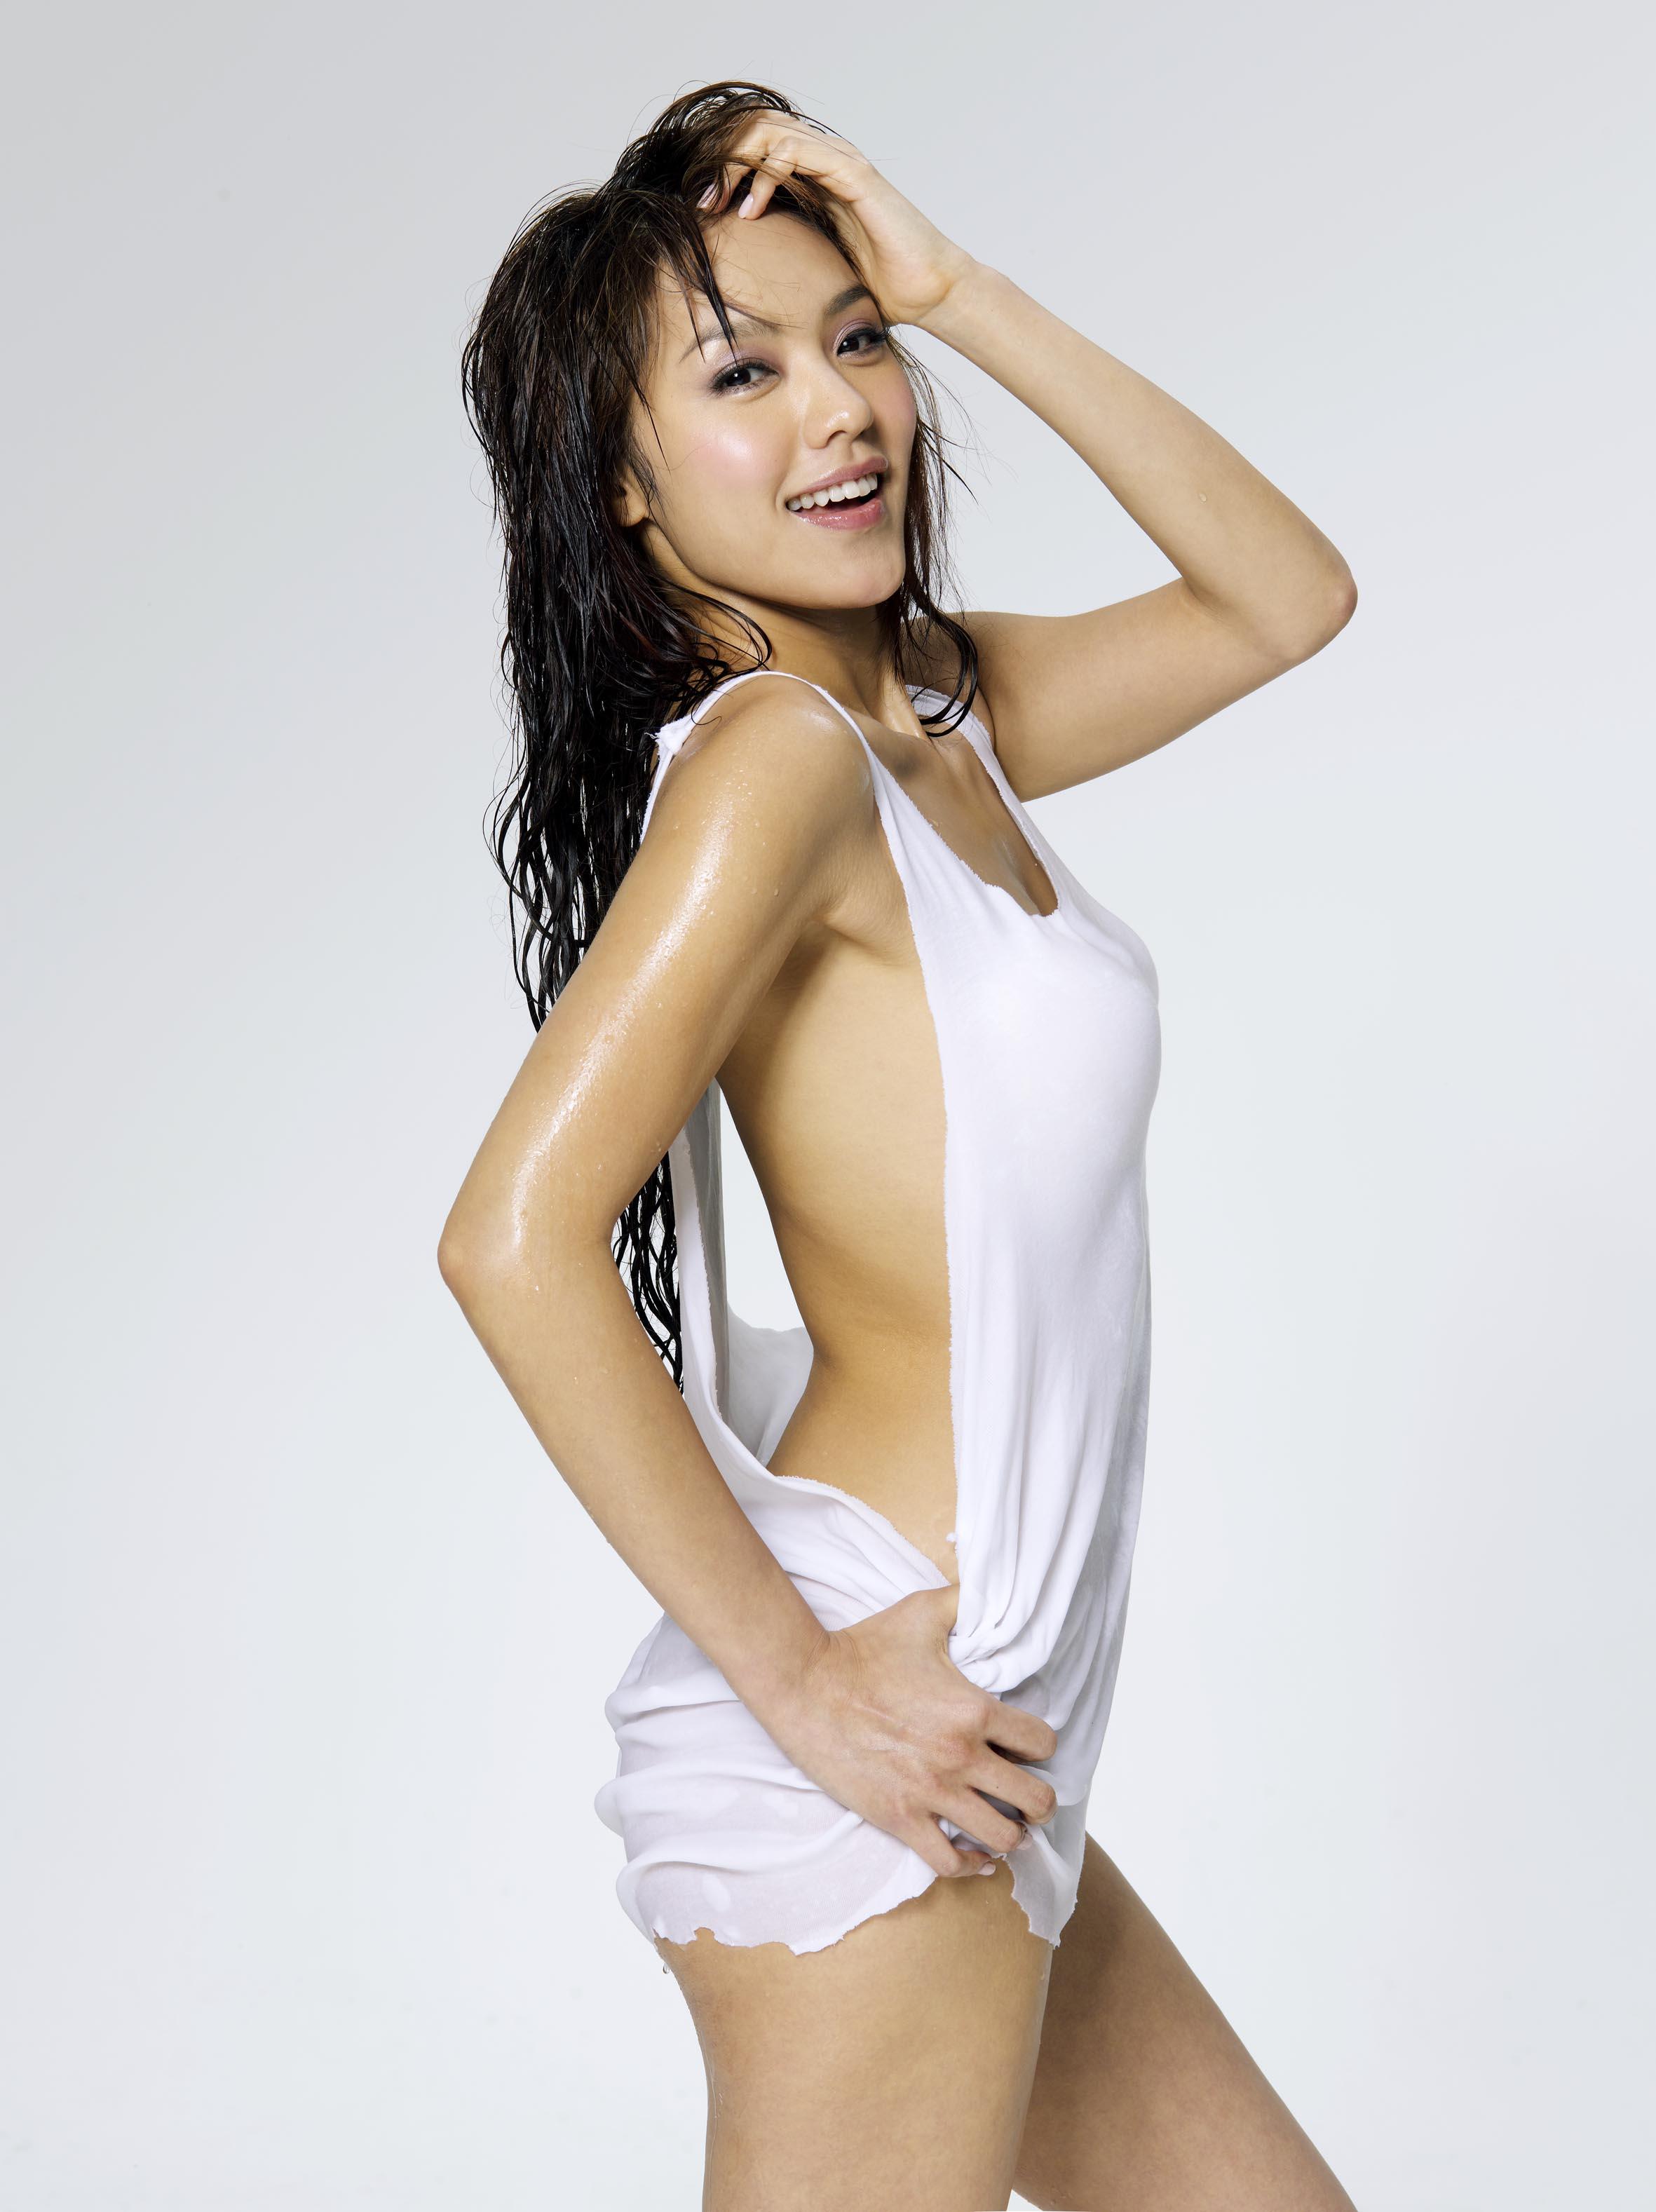 Смотреть онлайн фото кореянок 21 фотография